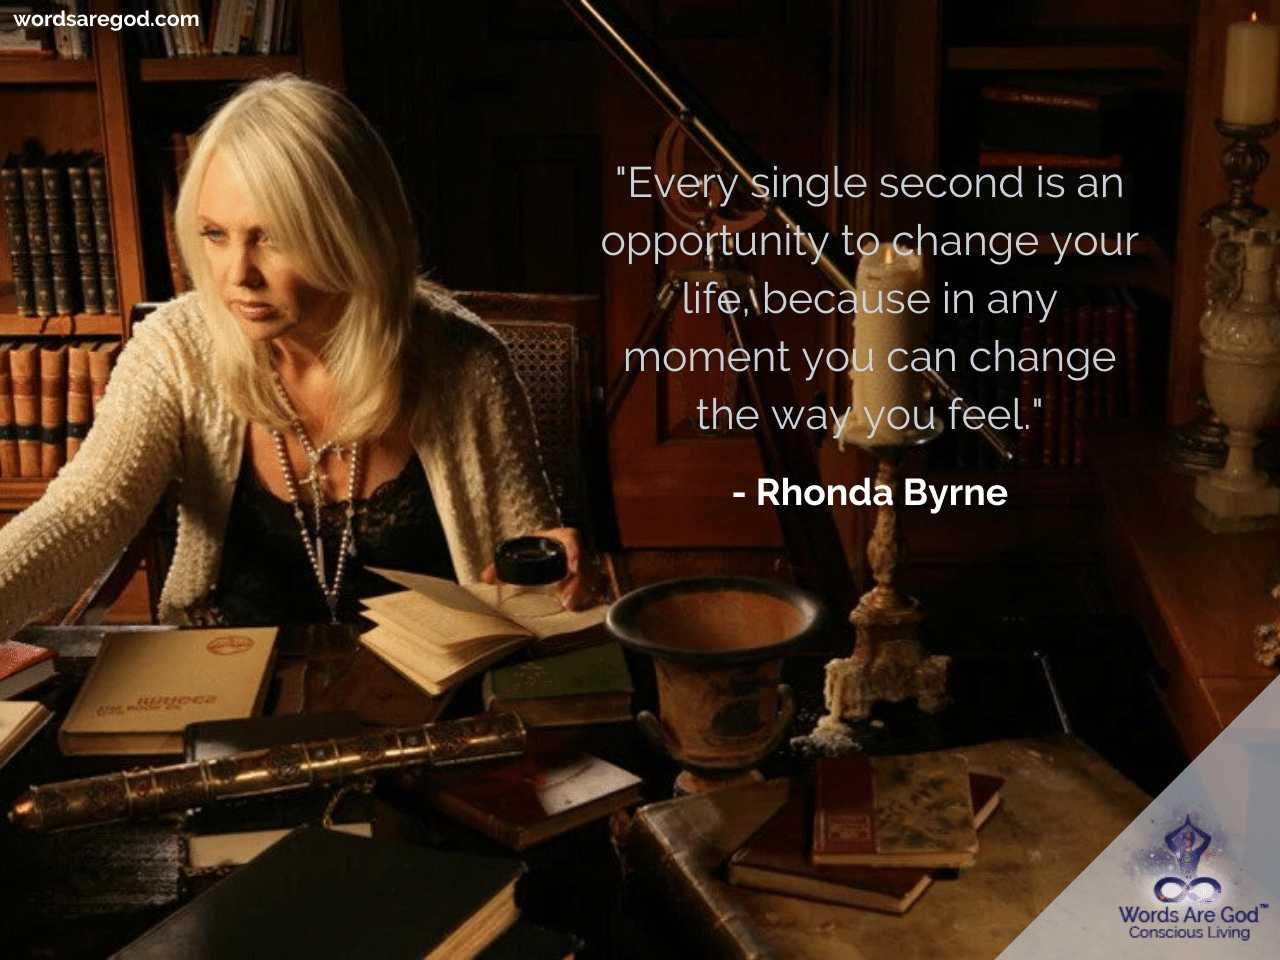 Rhonda Byrne Inspirational Quotes